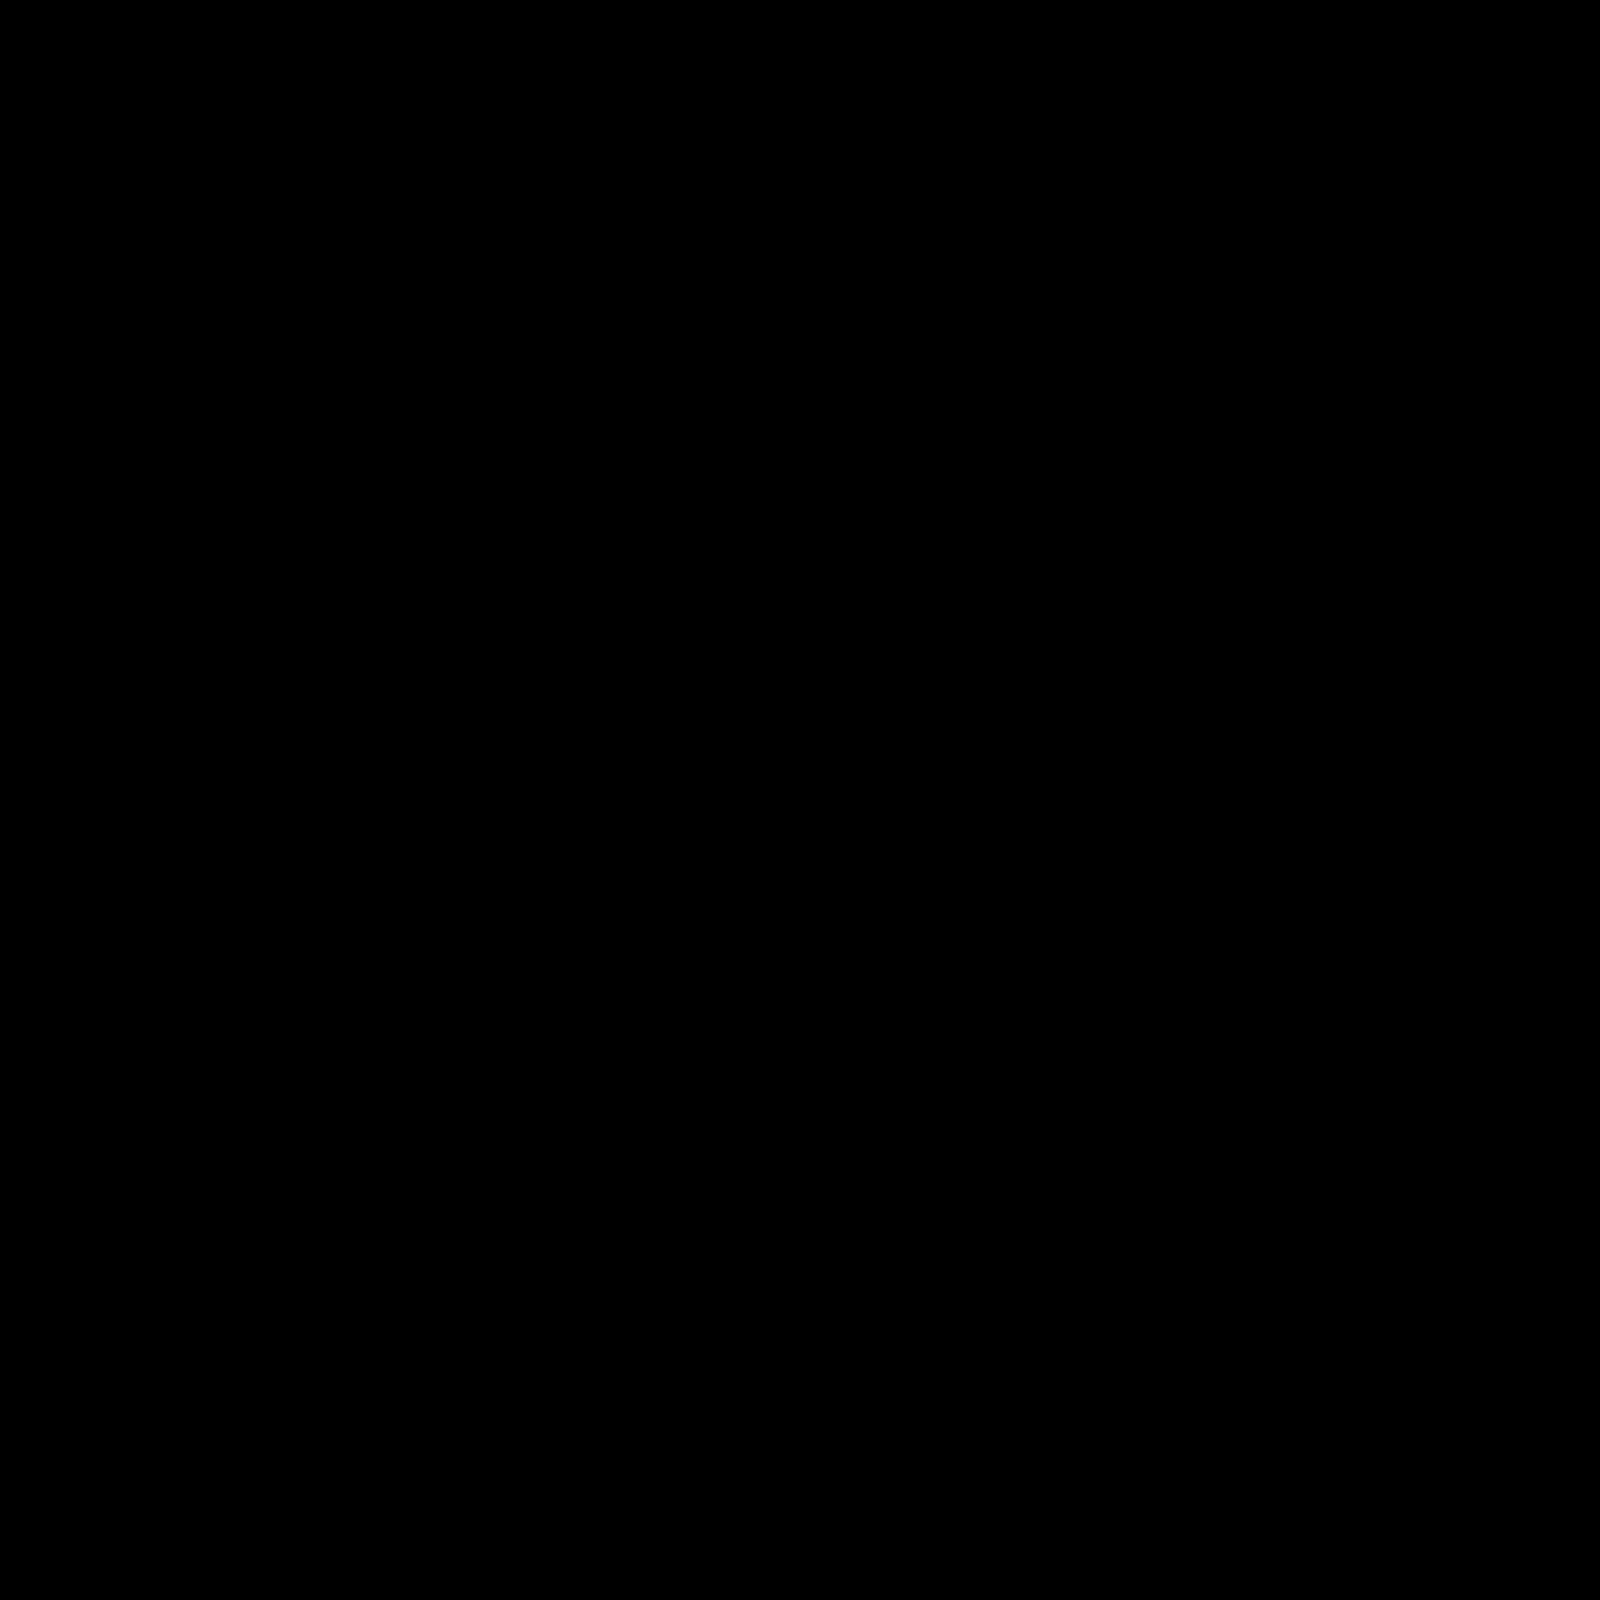 System Diagnostic icon